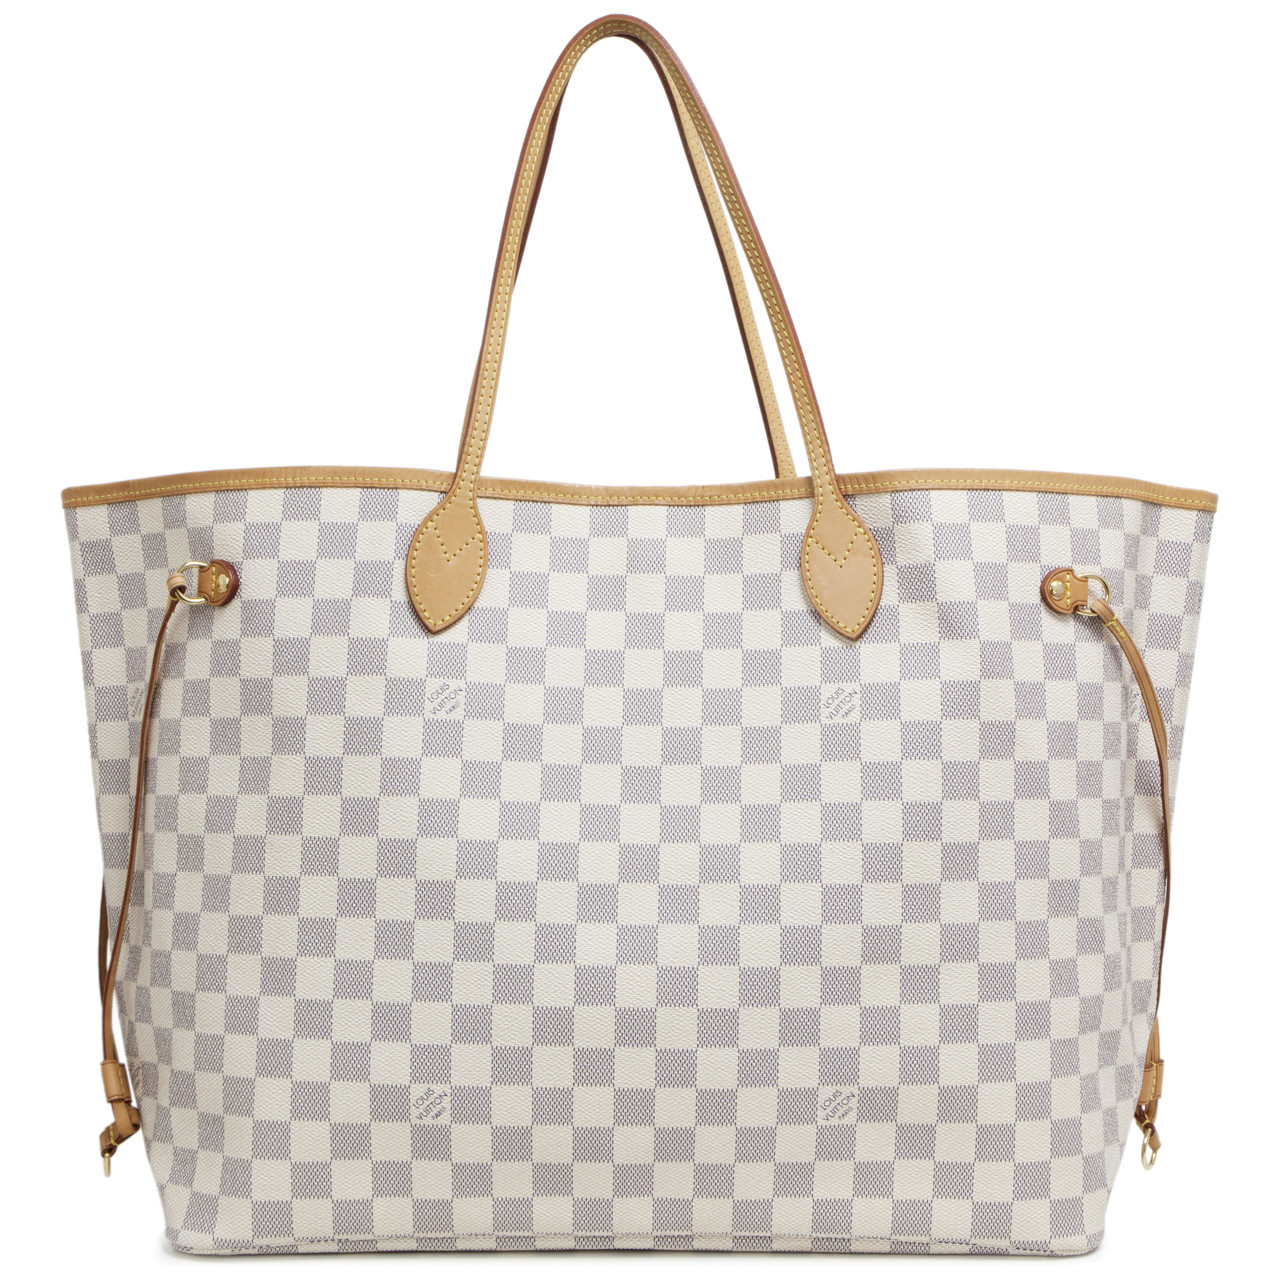 55d35d9557fa Louis Vuitton Damier Azur Neverfull GM - modaselle